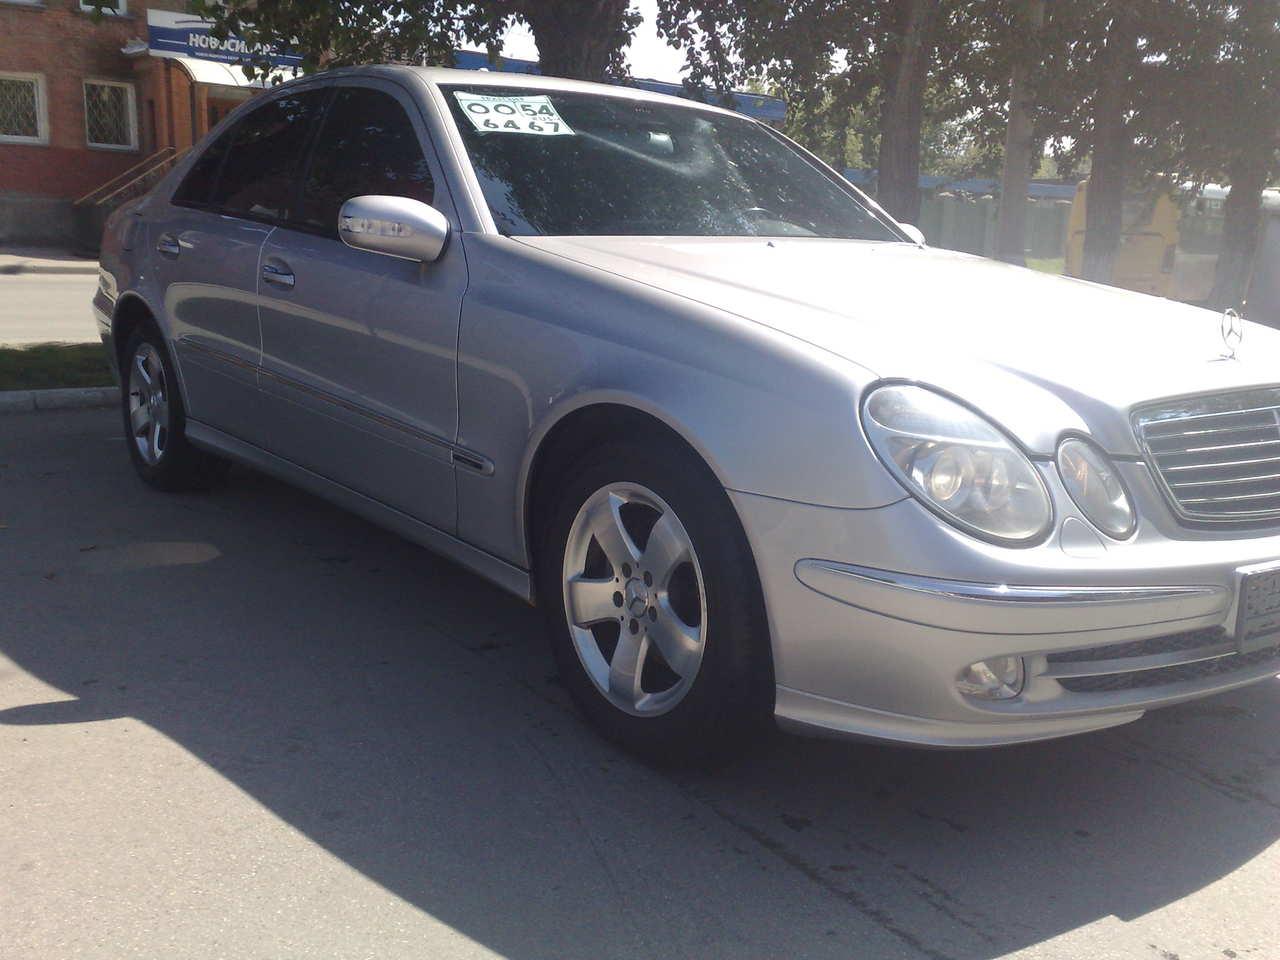 2003 mercedes benz e class photos 2 6 gasoline fr or rr for 2003 mercedes benz e class